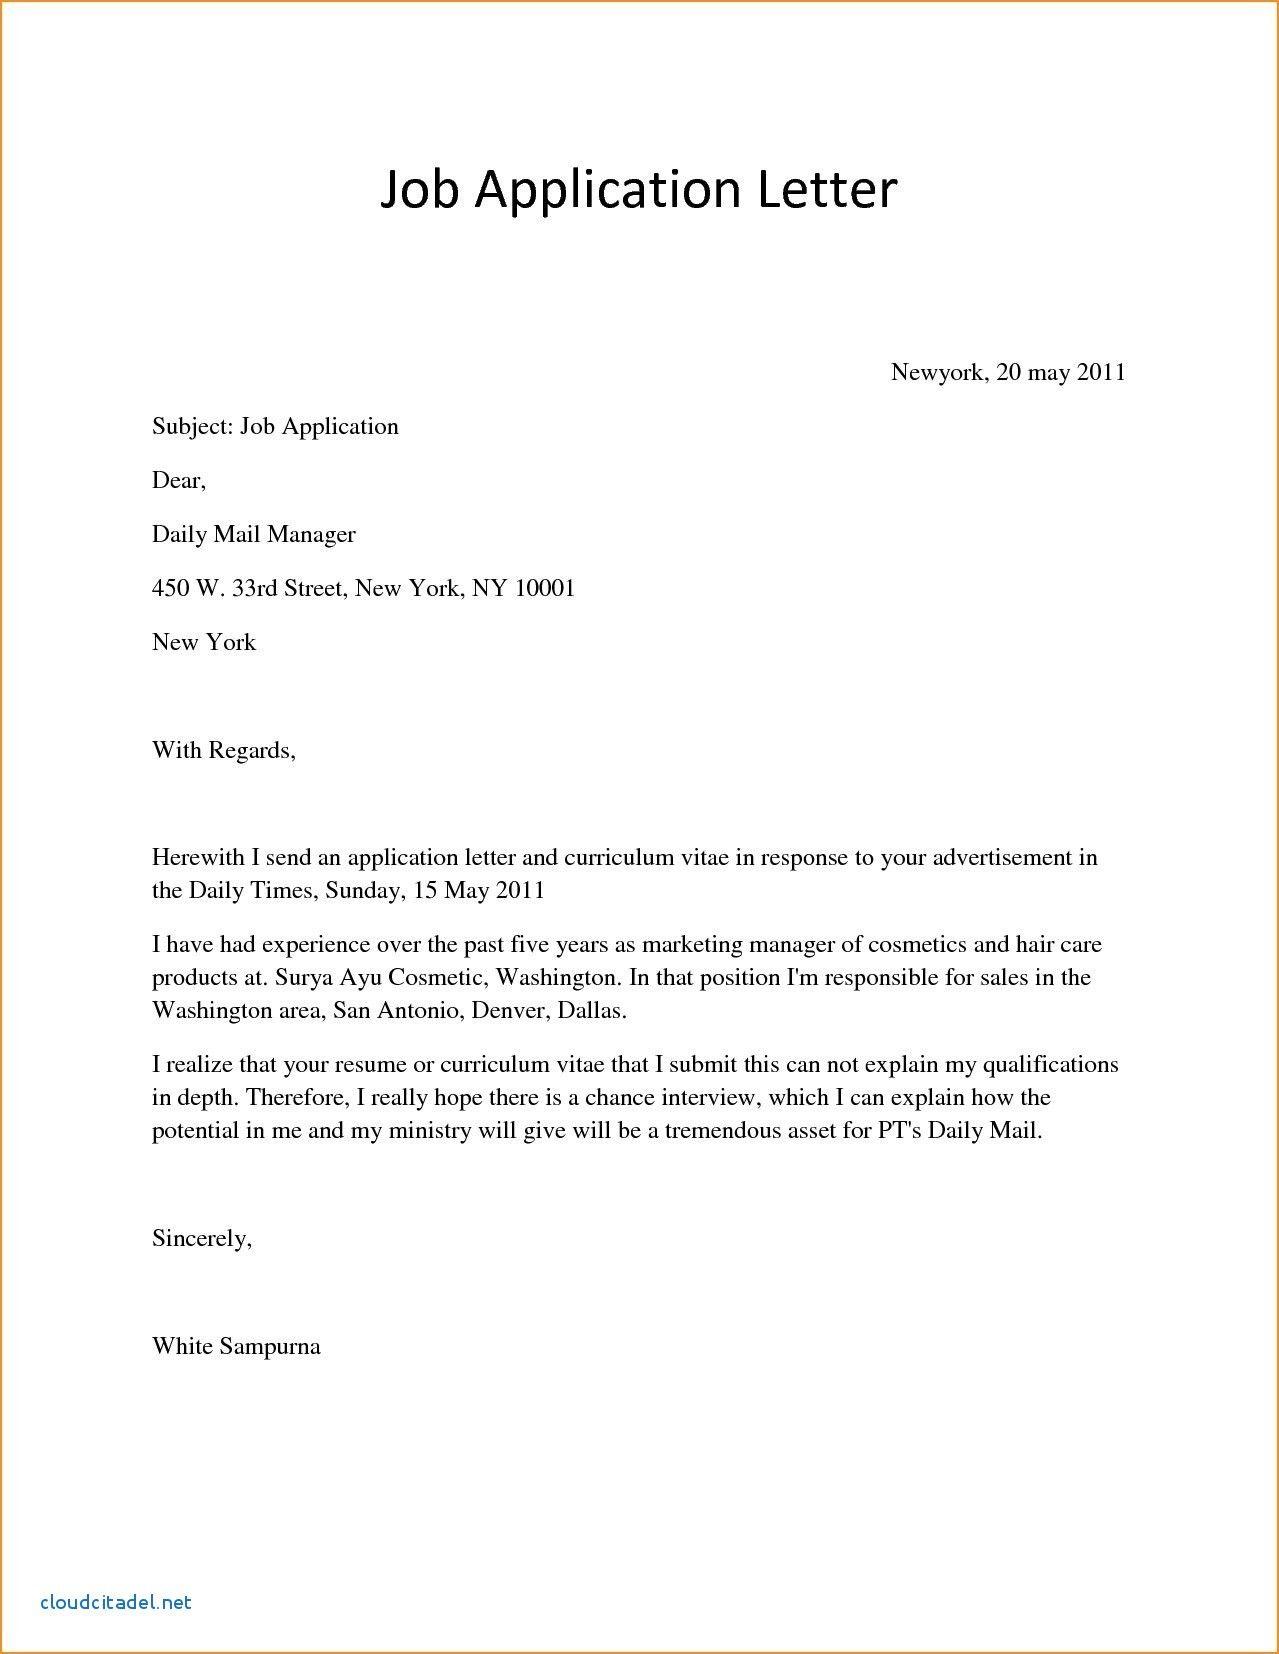 Valid Government Job Application Letter You Can Download For Full Letter Simple Job Application Letter Simple Application Letter Job Application Letter Sample